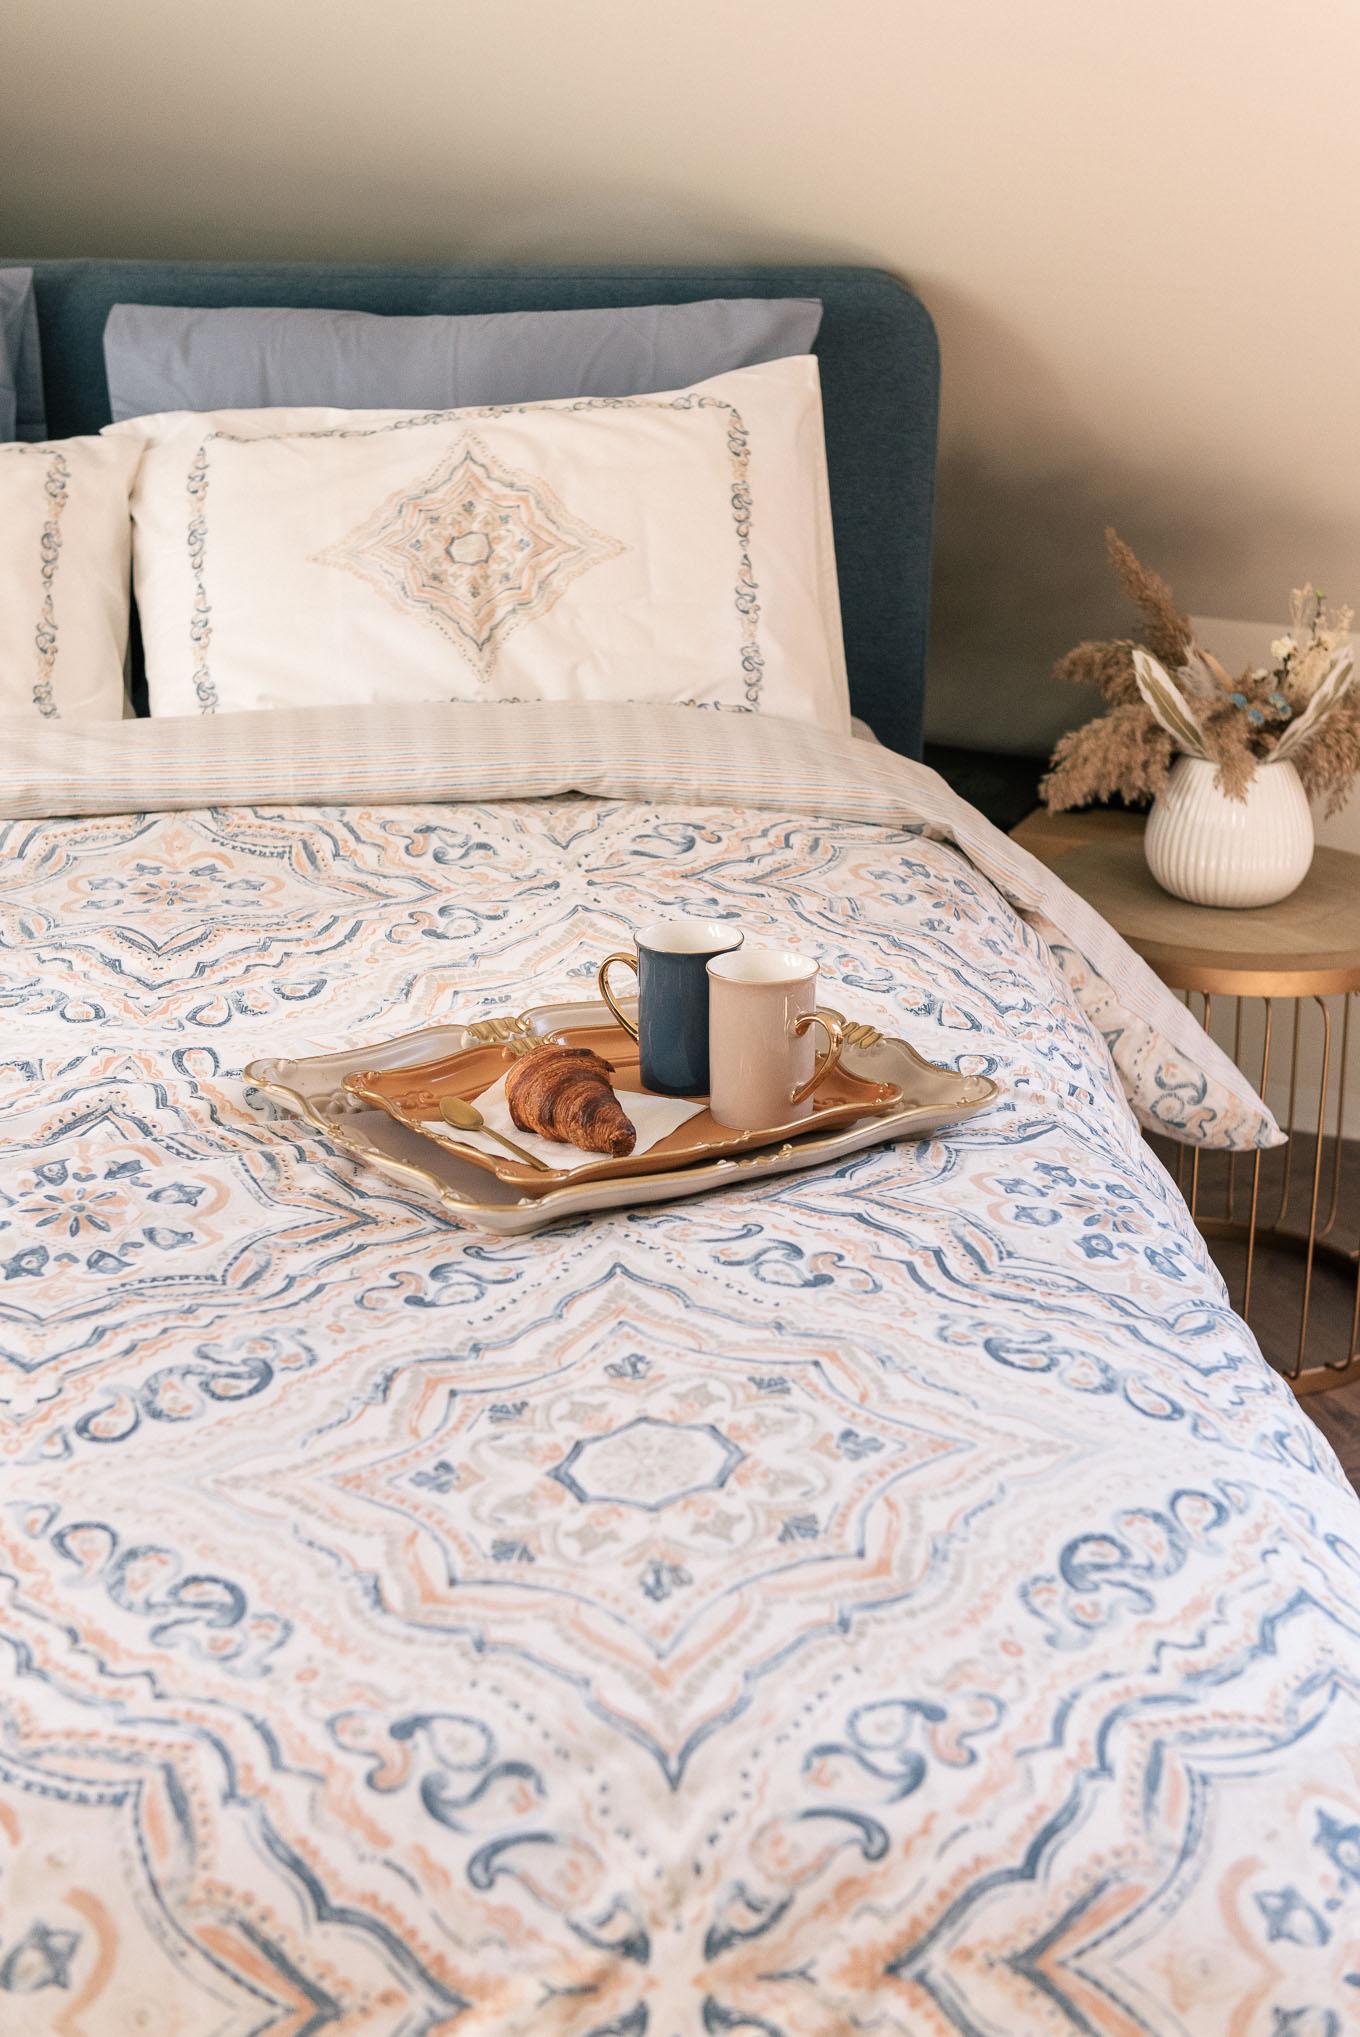 Madame Coco bedding set